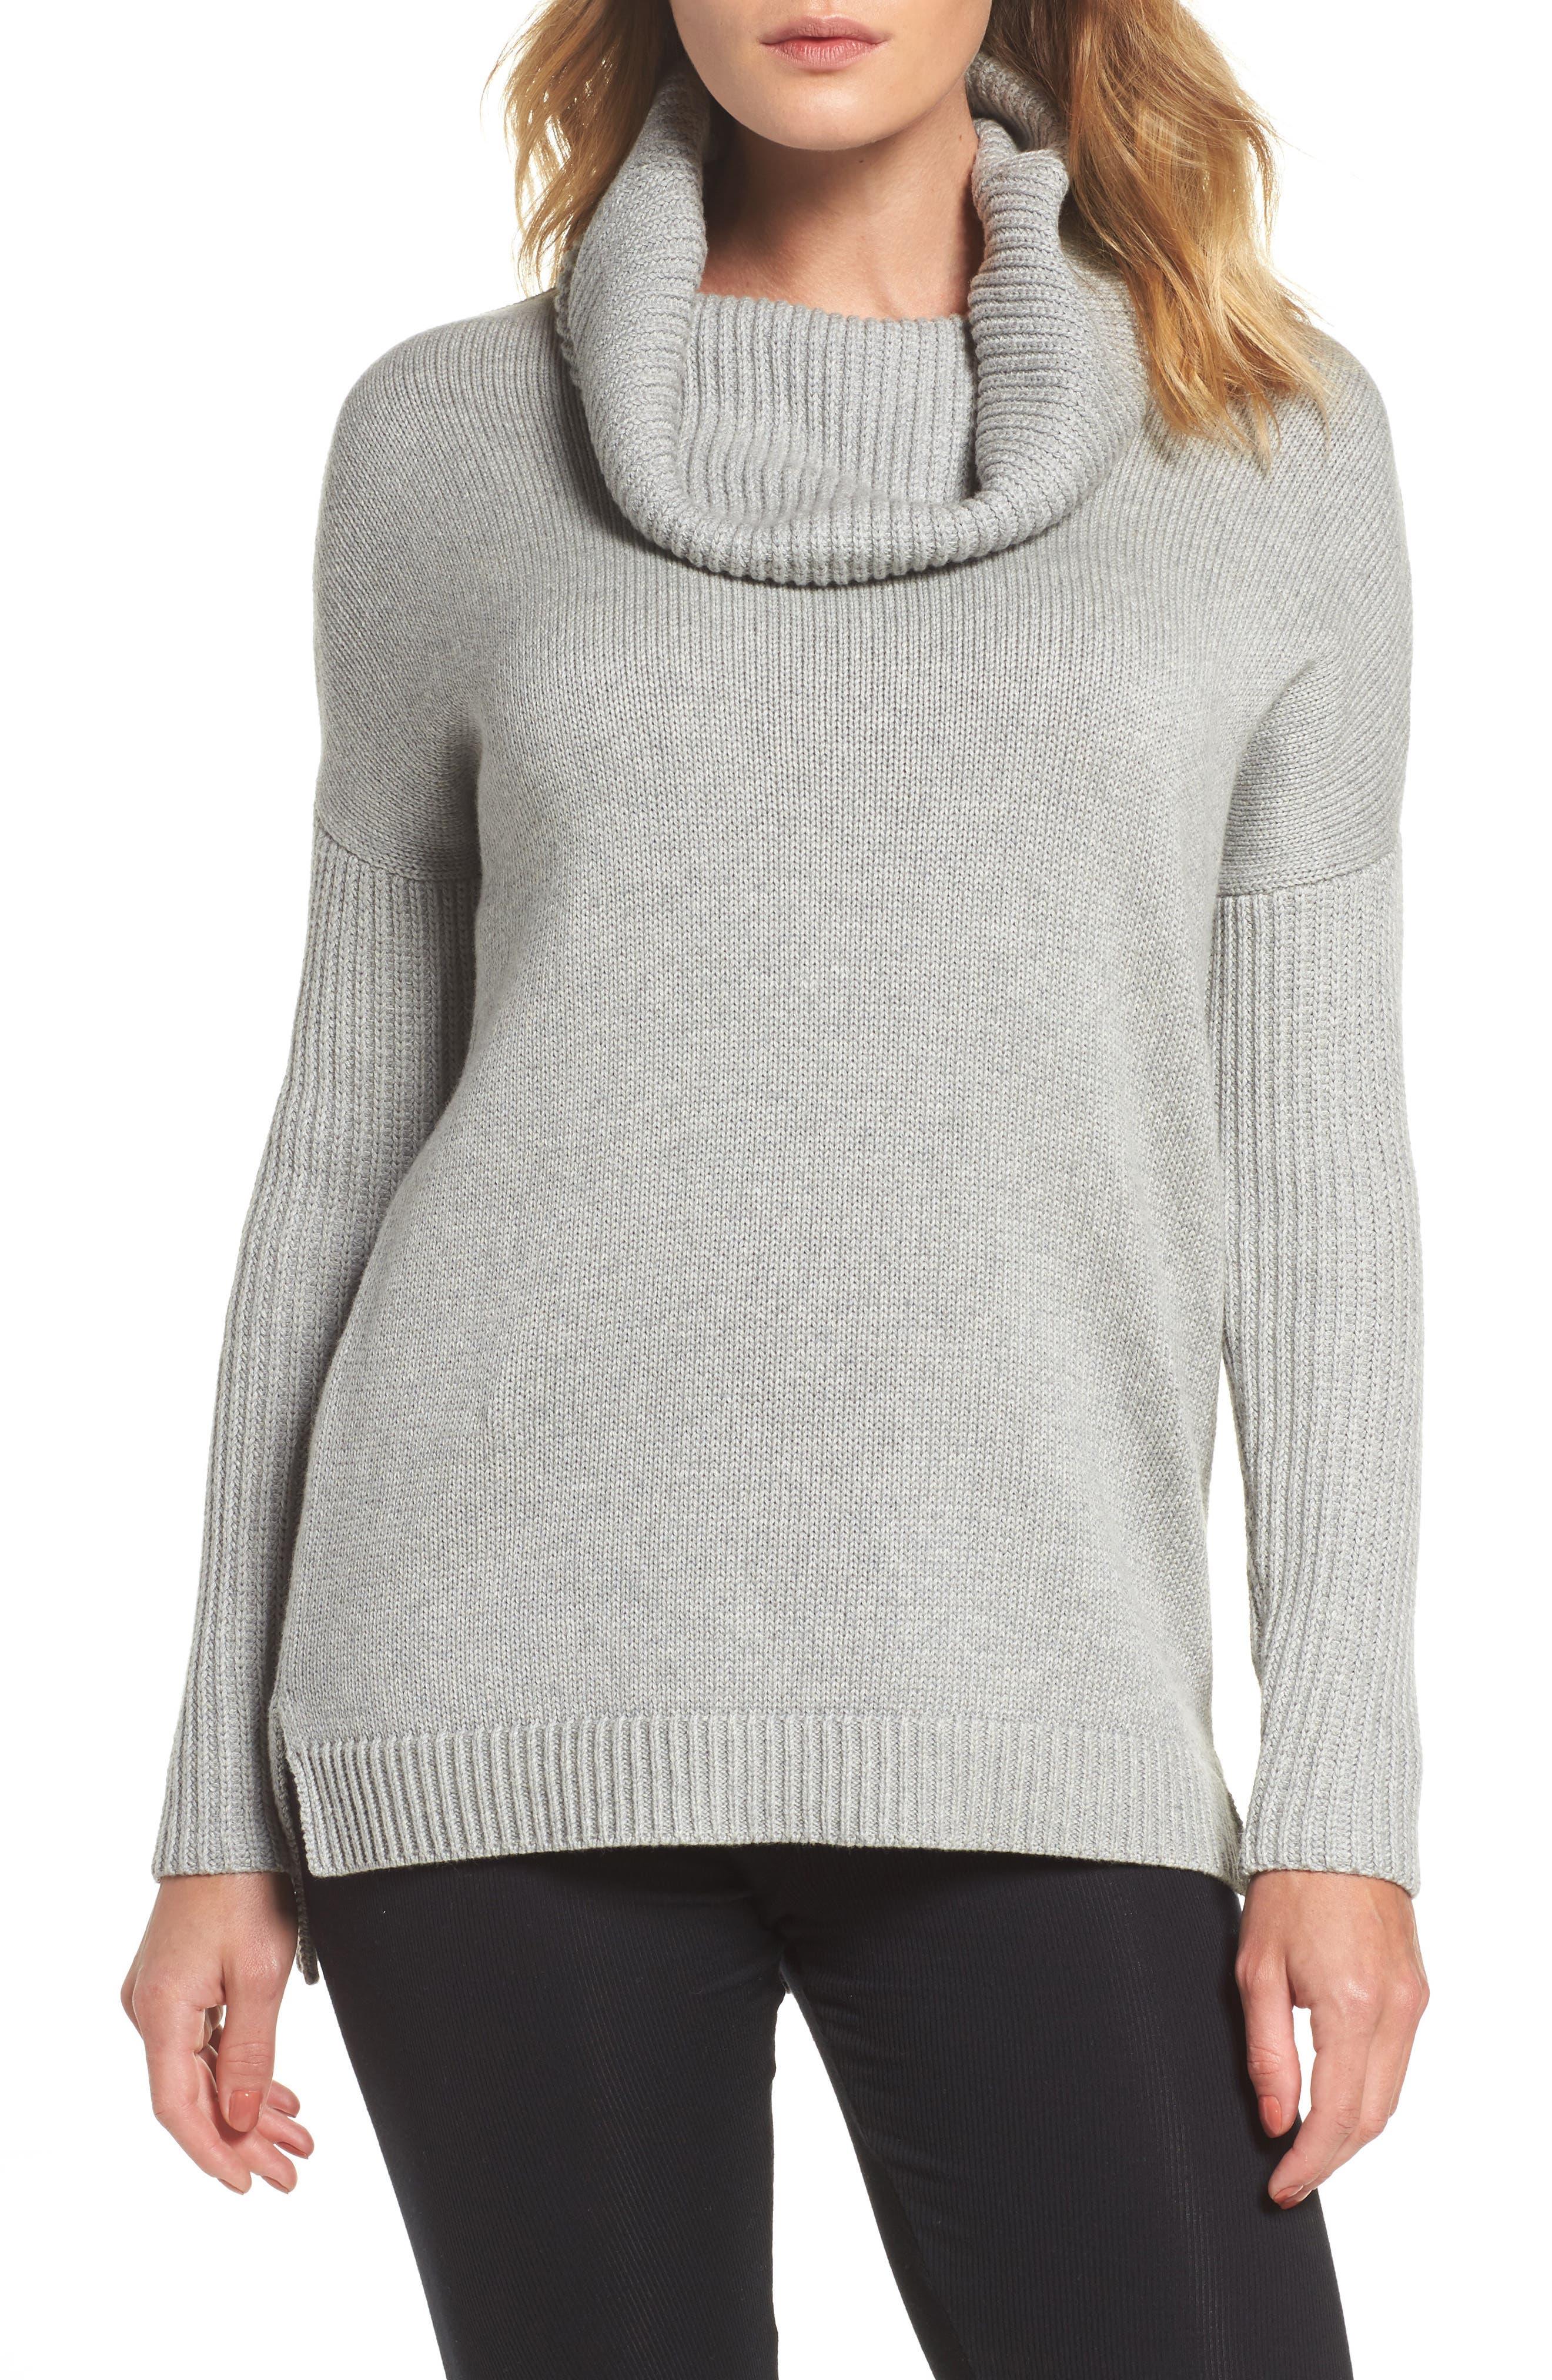 Alternate Image 1 Selected - UGG® Cowl Neck Tunic Sweater